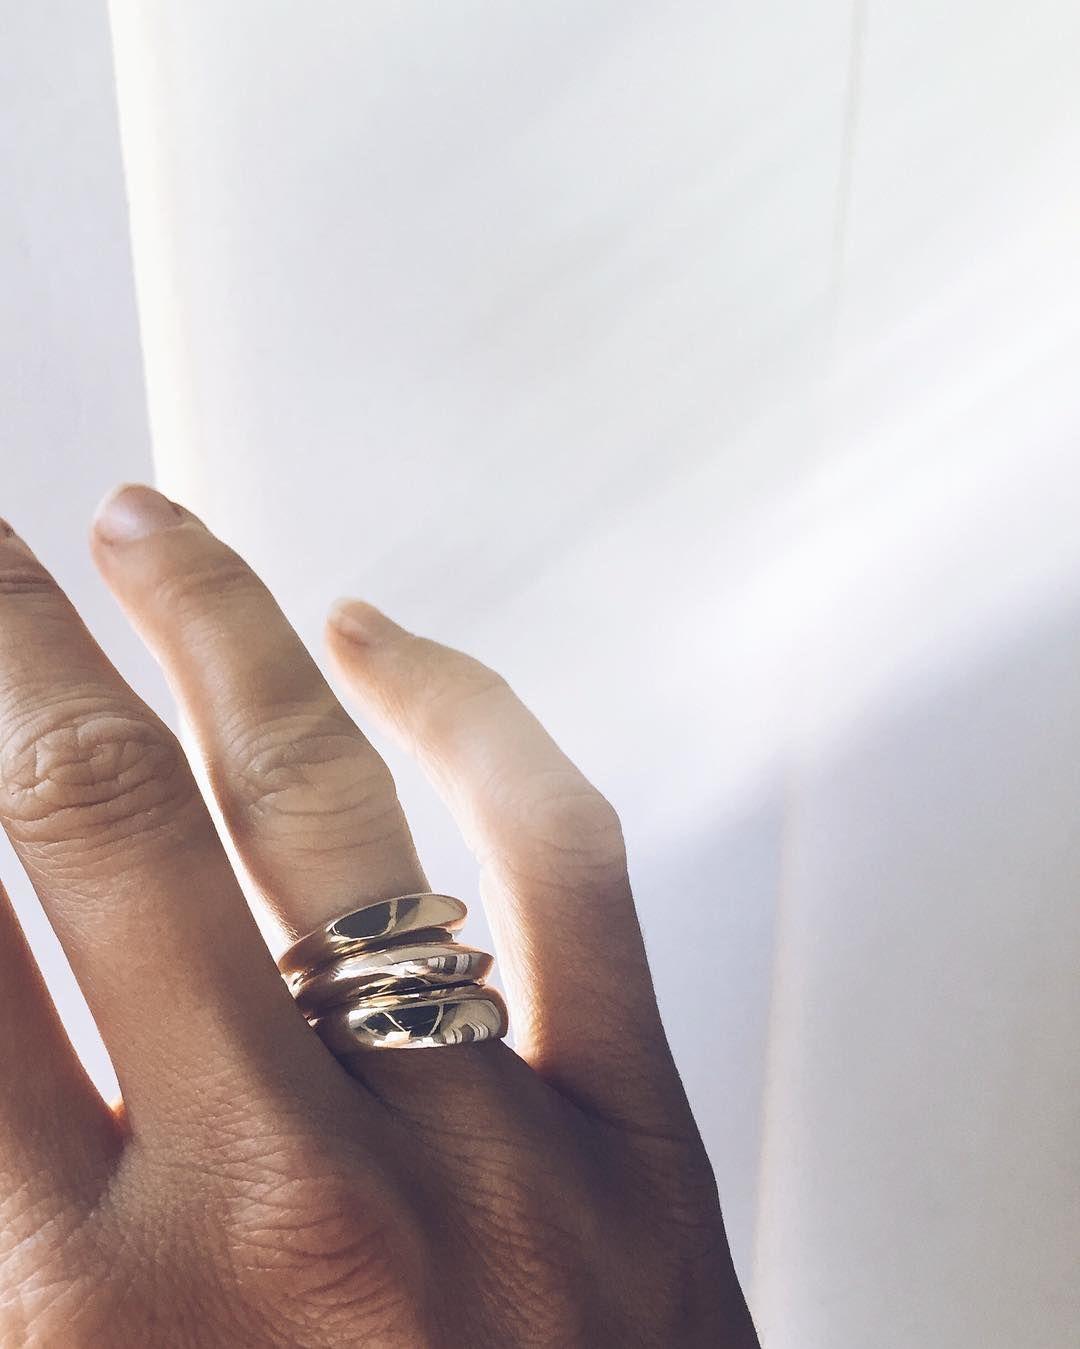 Ursa Major Jewelry Kate Jones Umajor Instagram Photos And Videos Jewellery Advertising Jewelry Jewelry Photoshoot